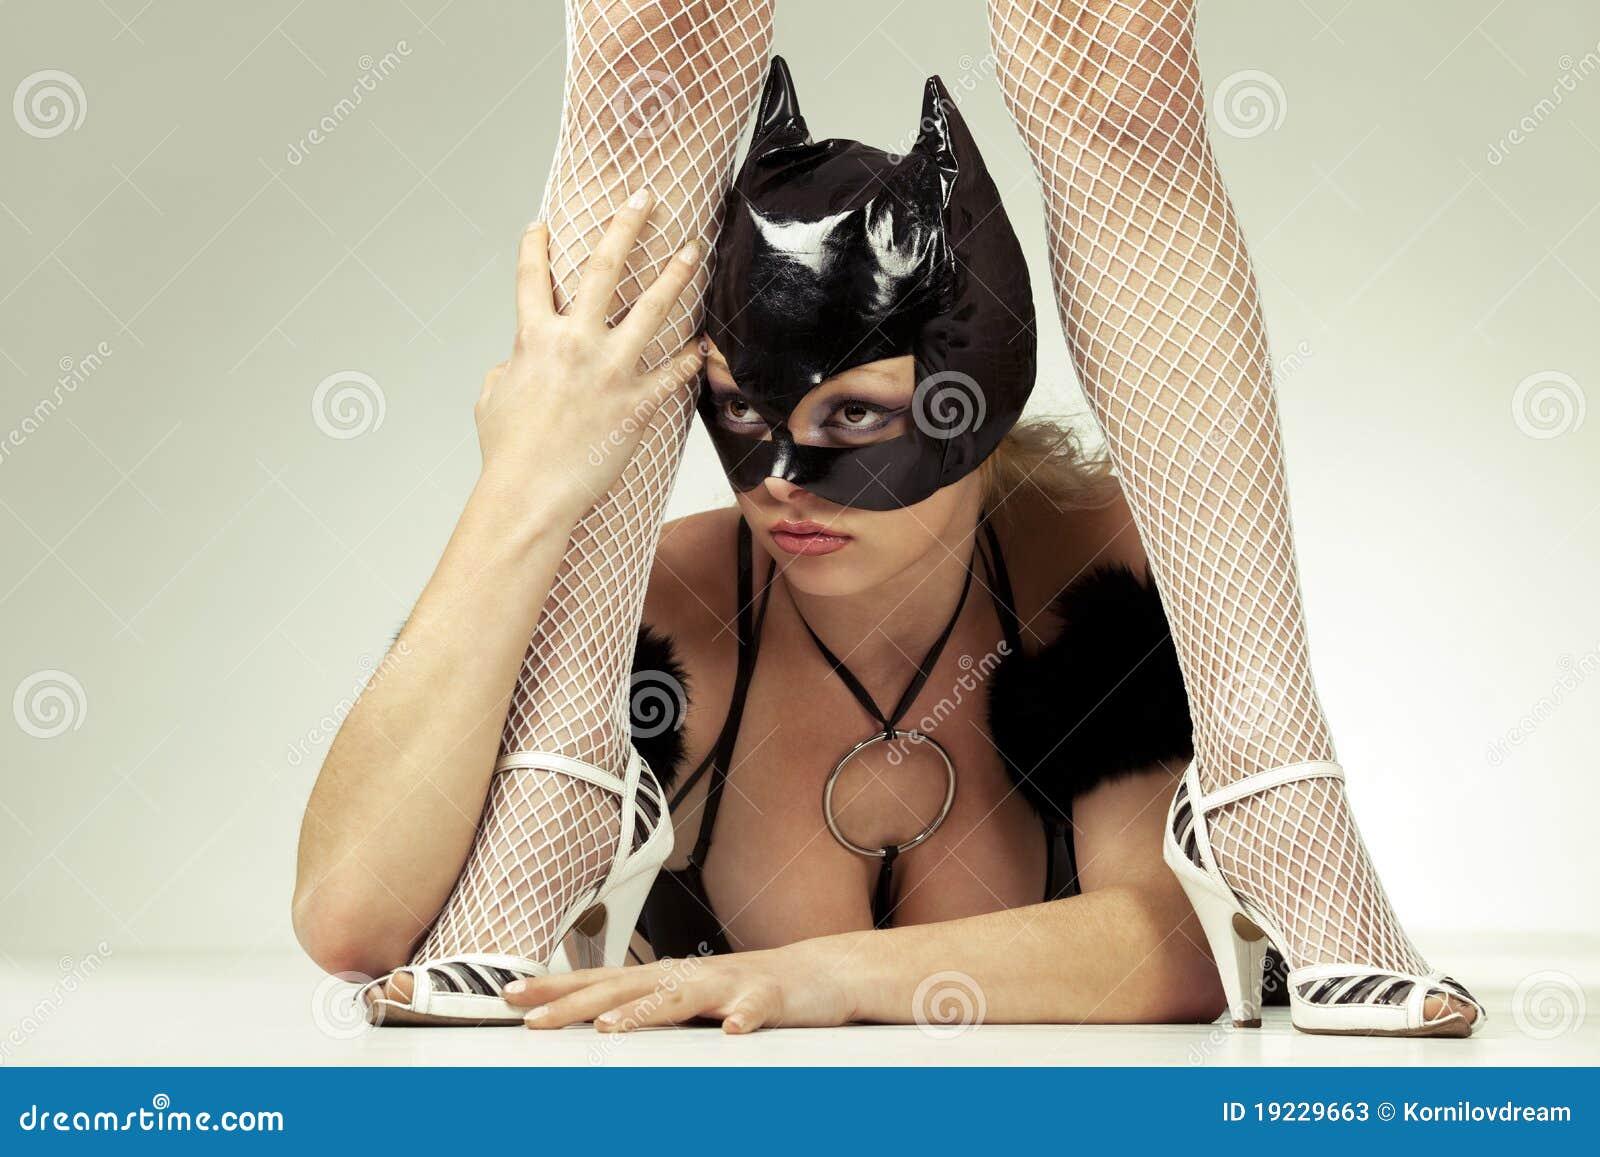 Black cat is next to dominatrix`s legs